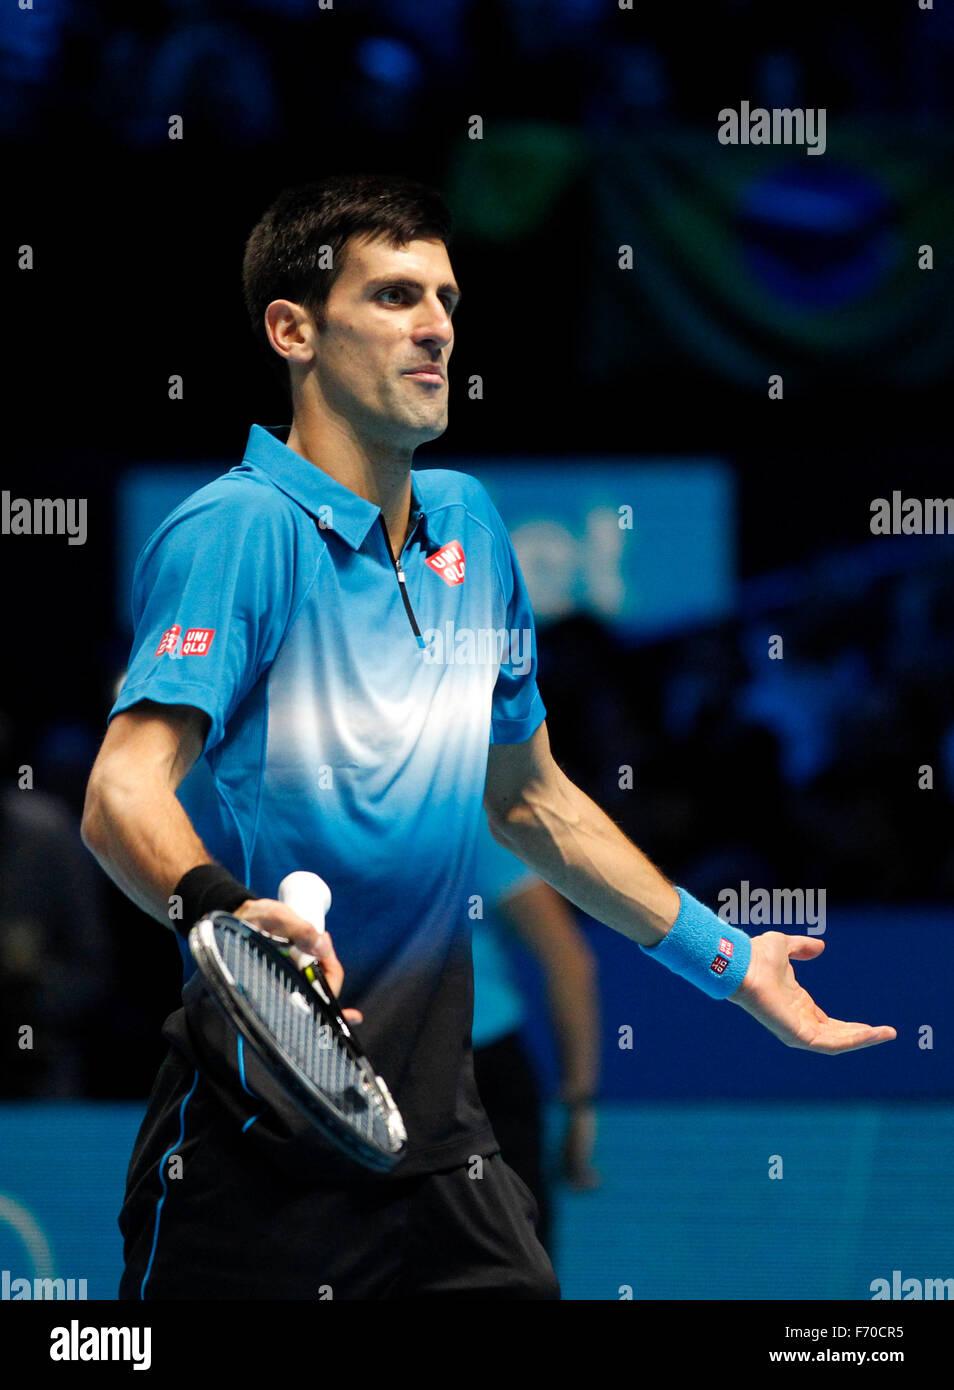 London, Britain  22nd Nov, 2015  Novak Djokovic of Serbia